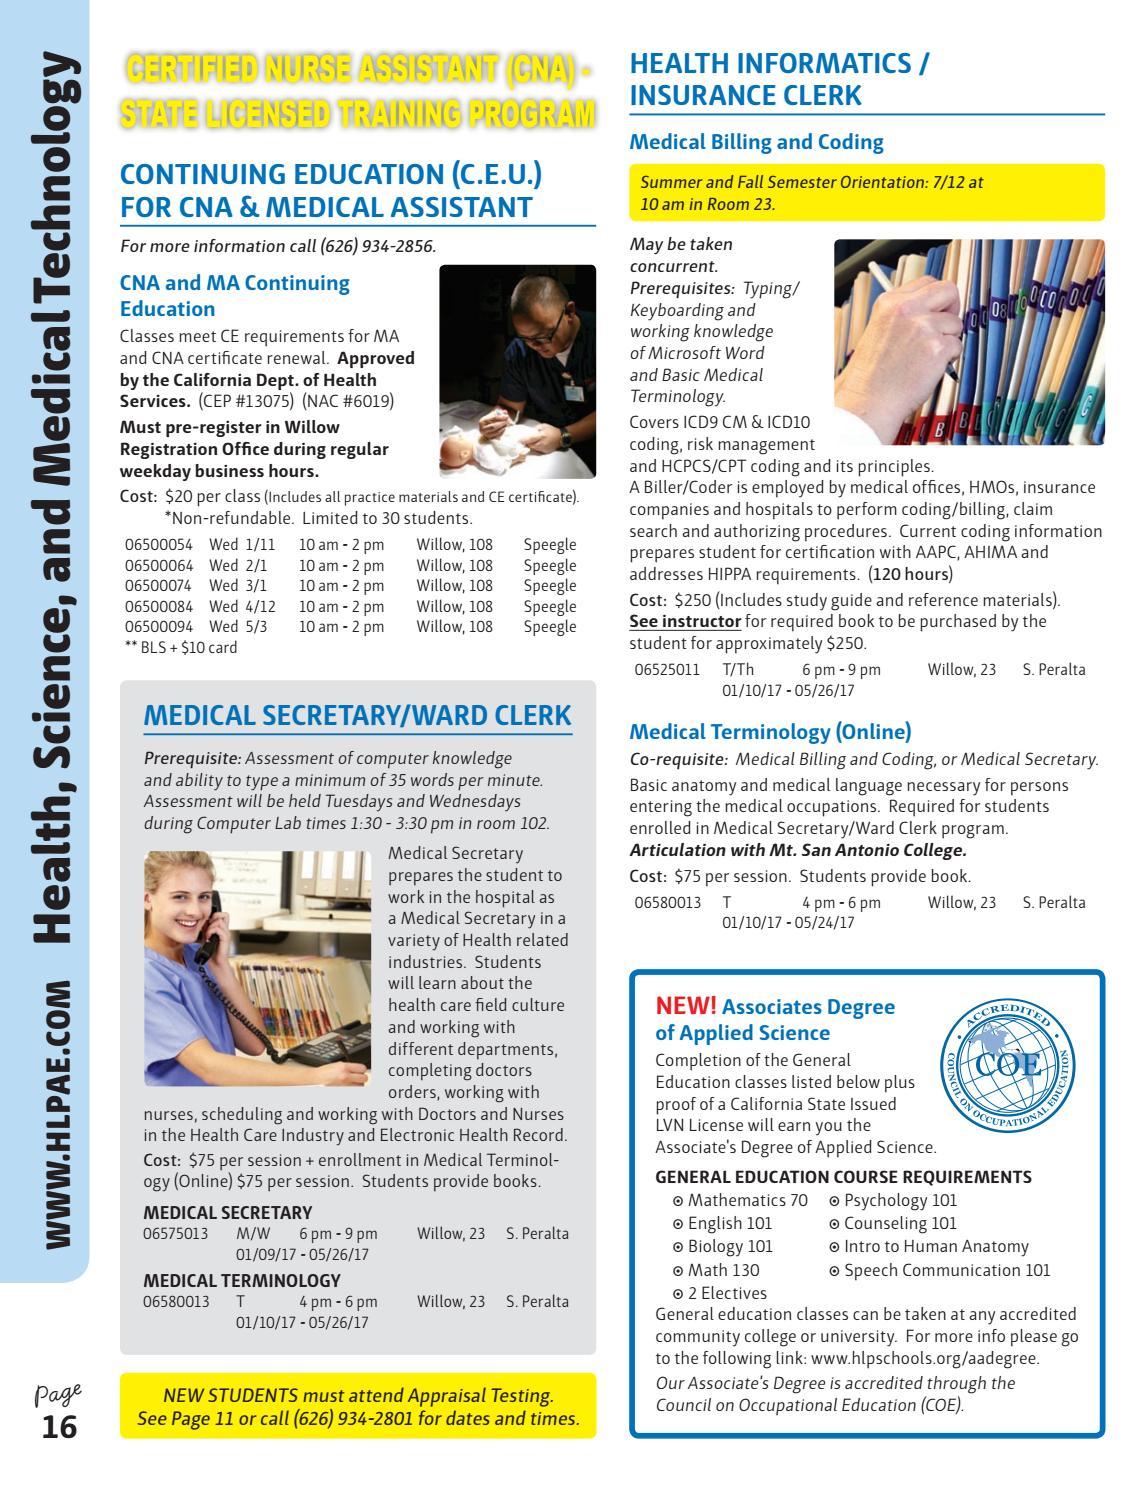 Hacienda la puente adult education spring 2017 catalog by q hacienda la puente adult education spring 2017 catalog by q press issuu 1betcityfo Images